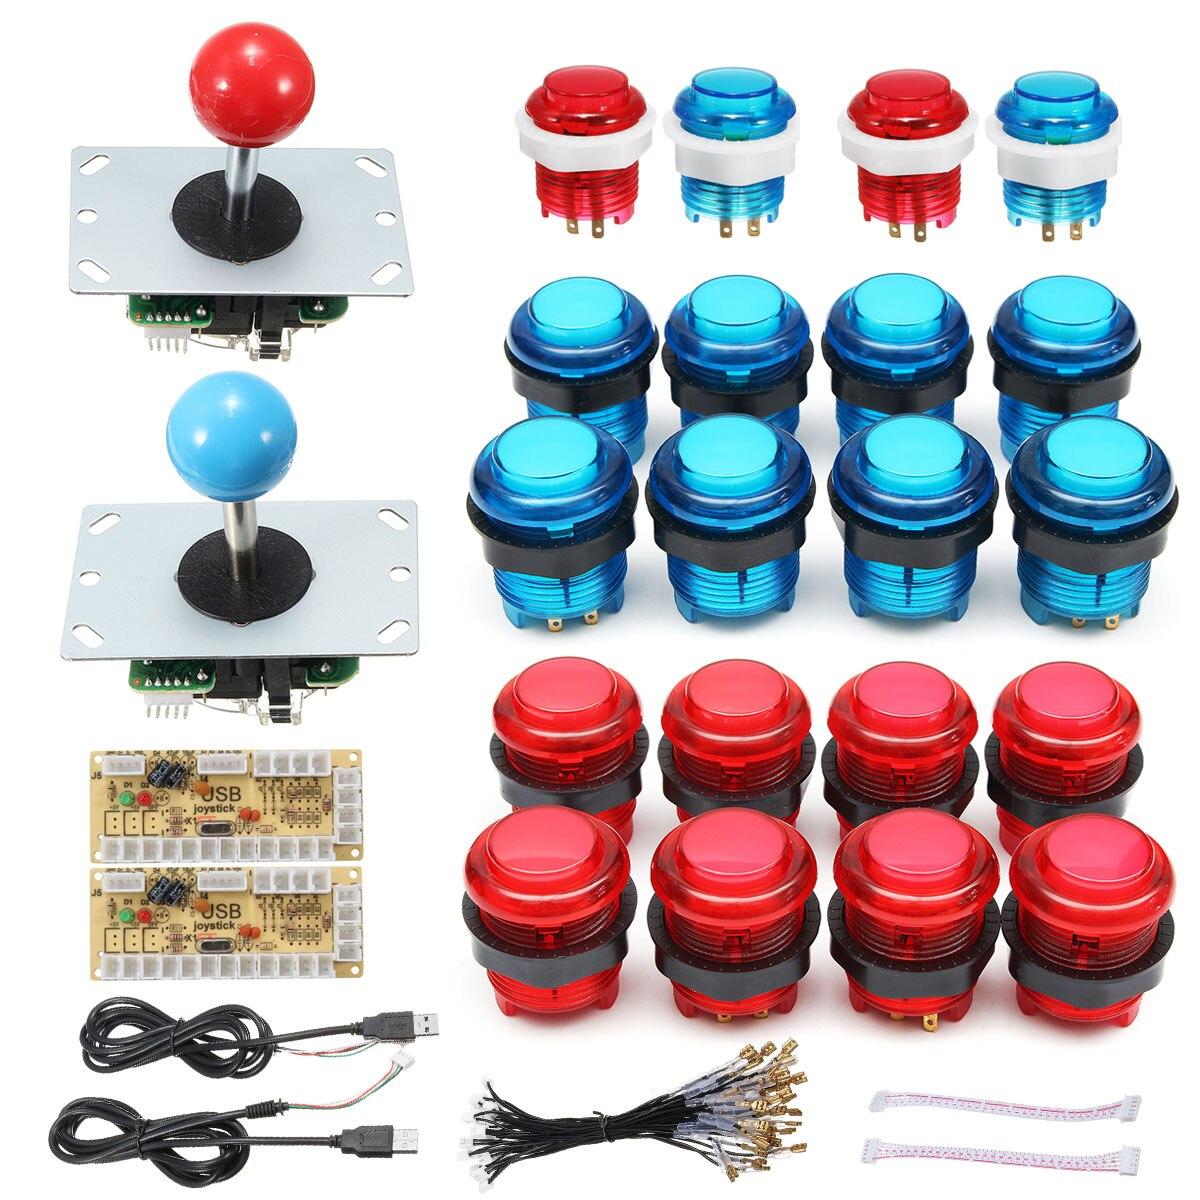 DIY Joystick Arcade Kits 2 Players With 20 LED Arcade Buttons + 2 Joysticks + 2 USB Encoder Kit + Cables Arcade Game Parts Set(China)